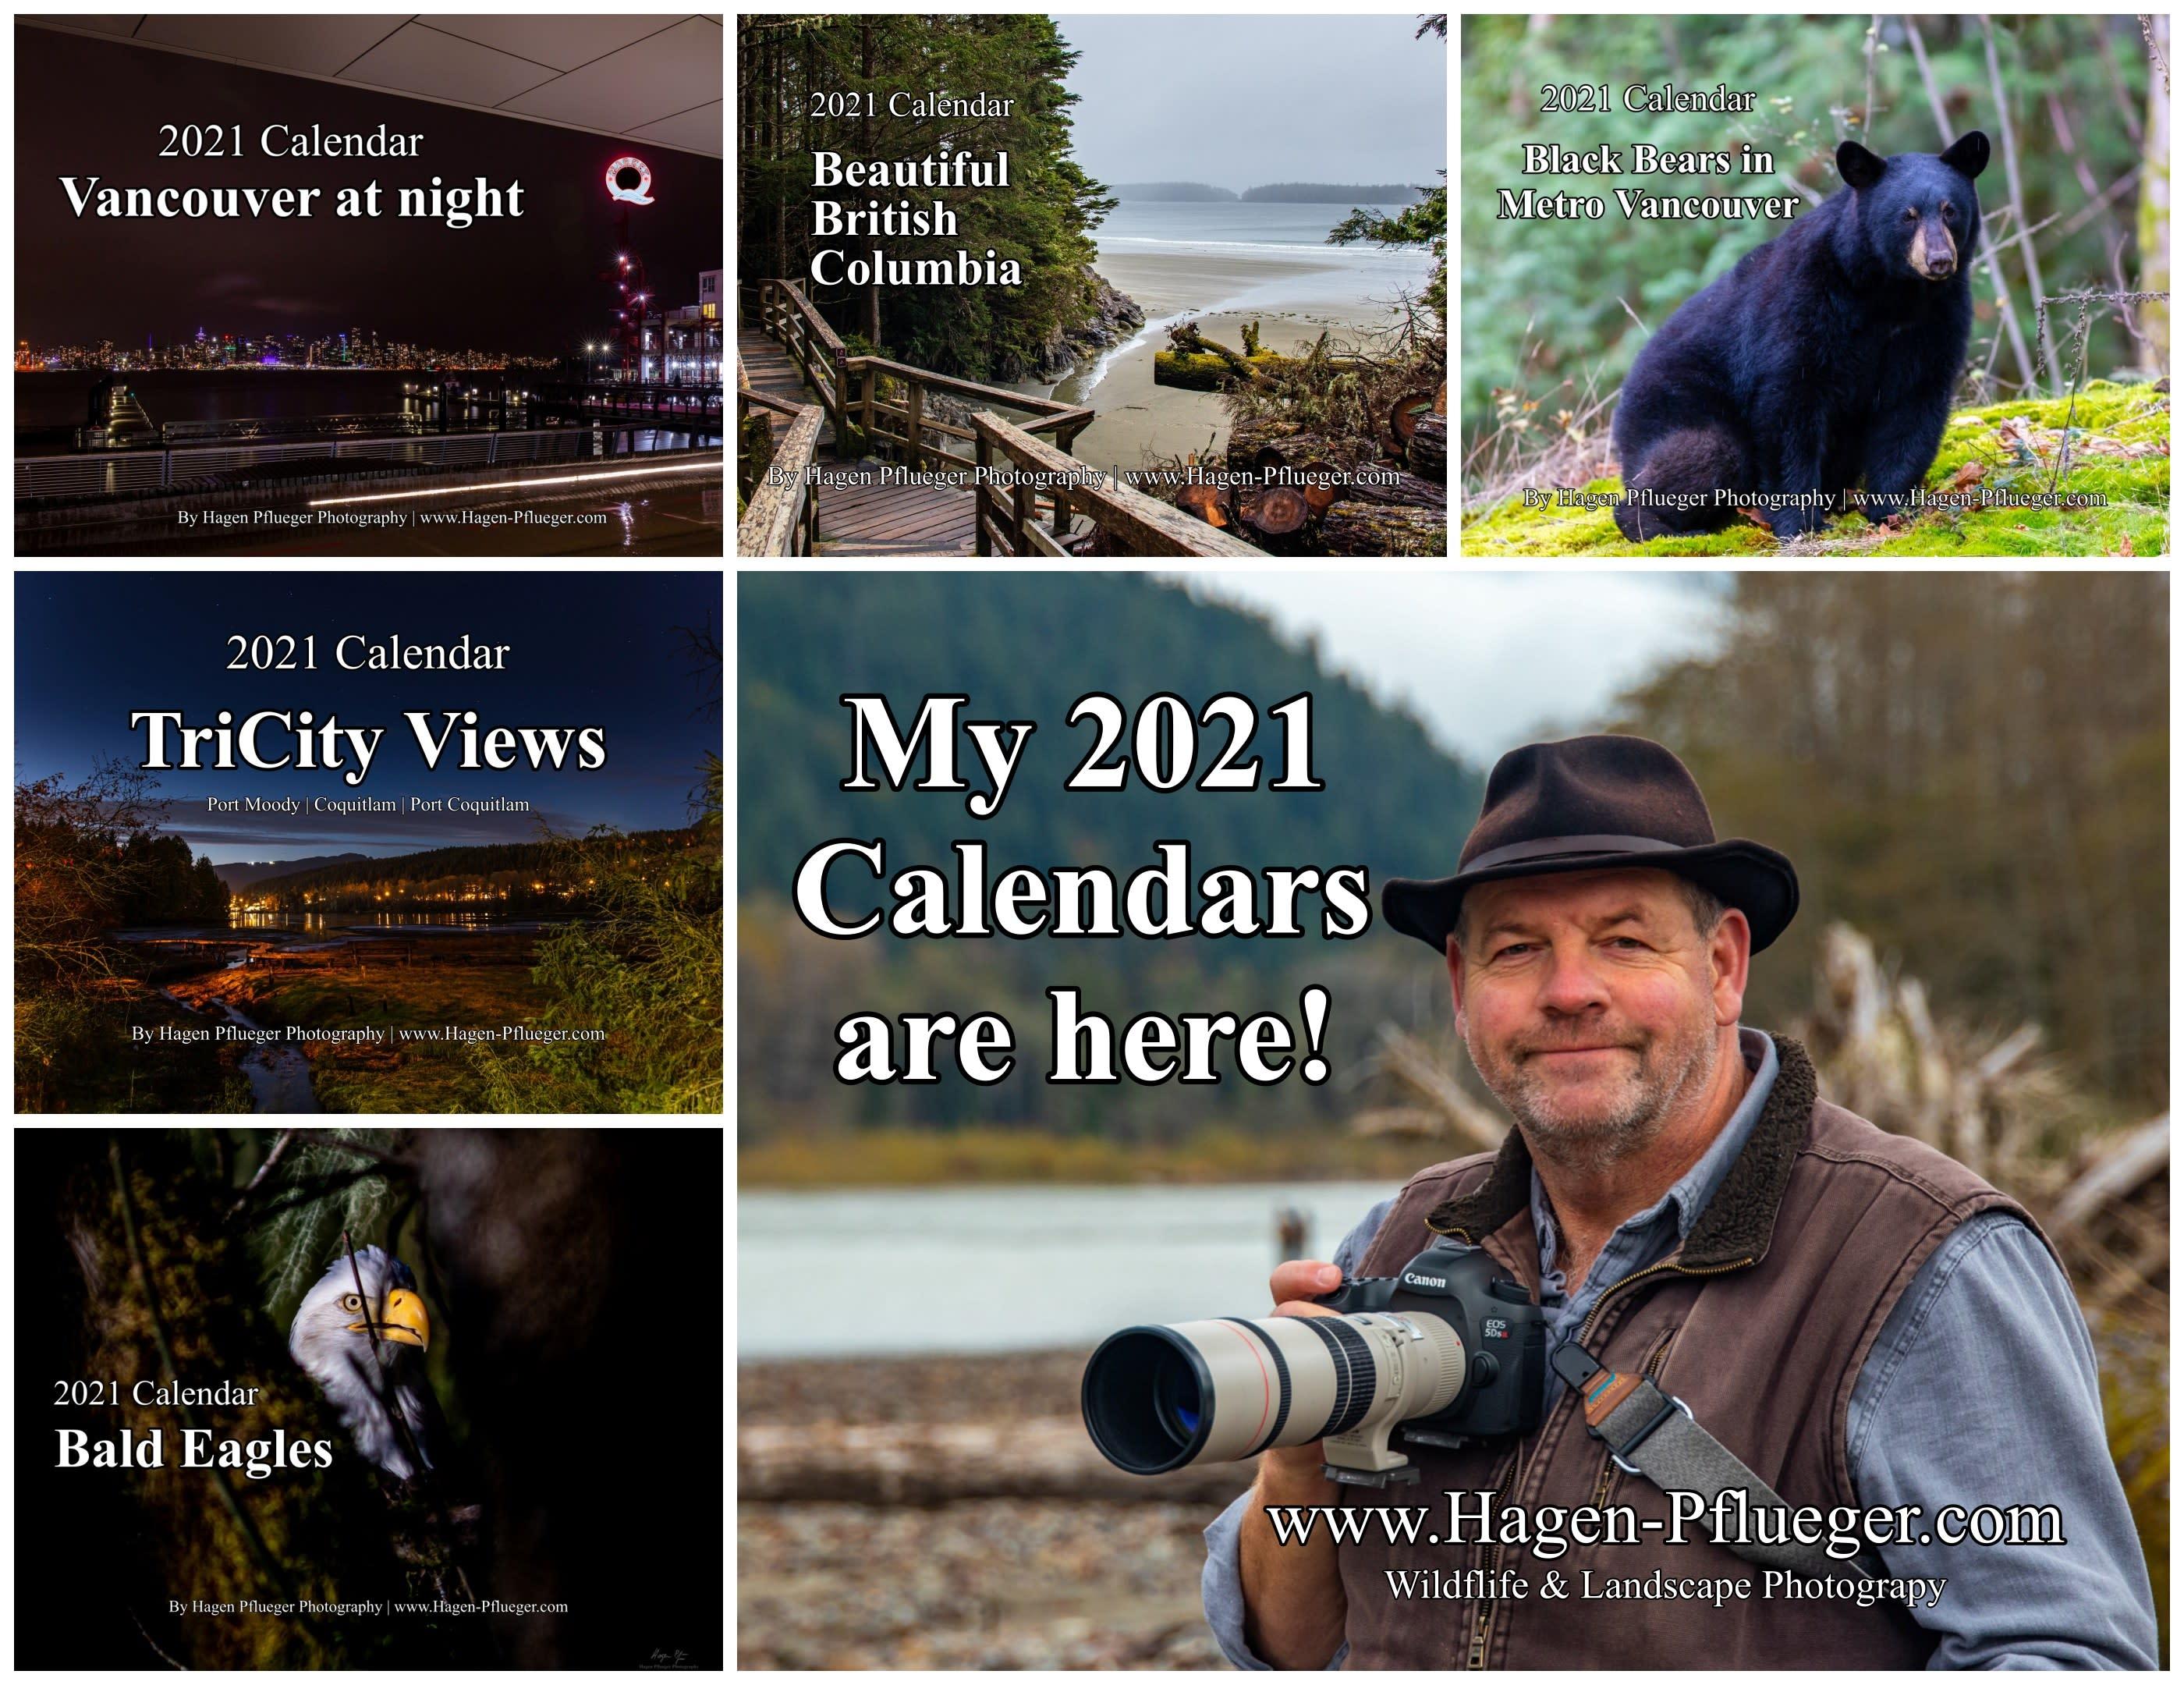 Calendar promotion